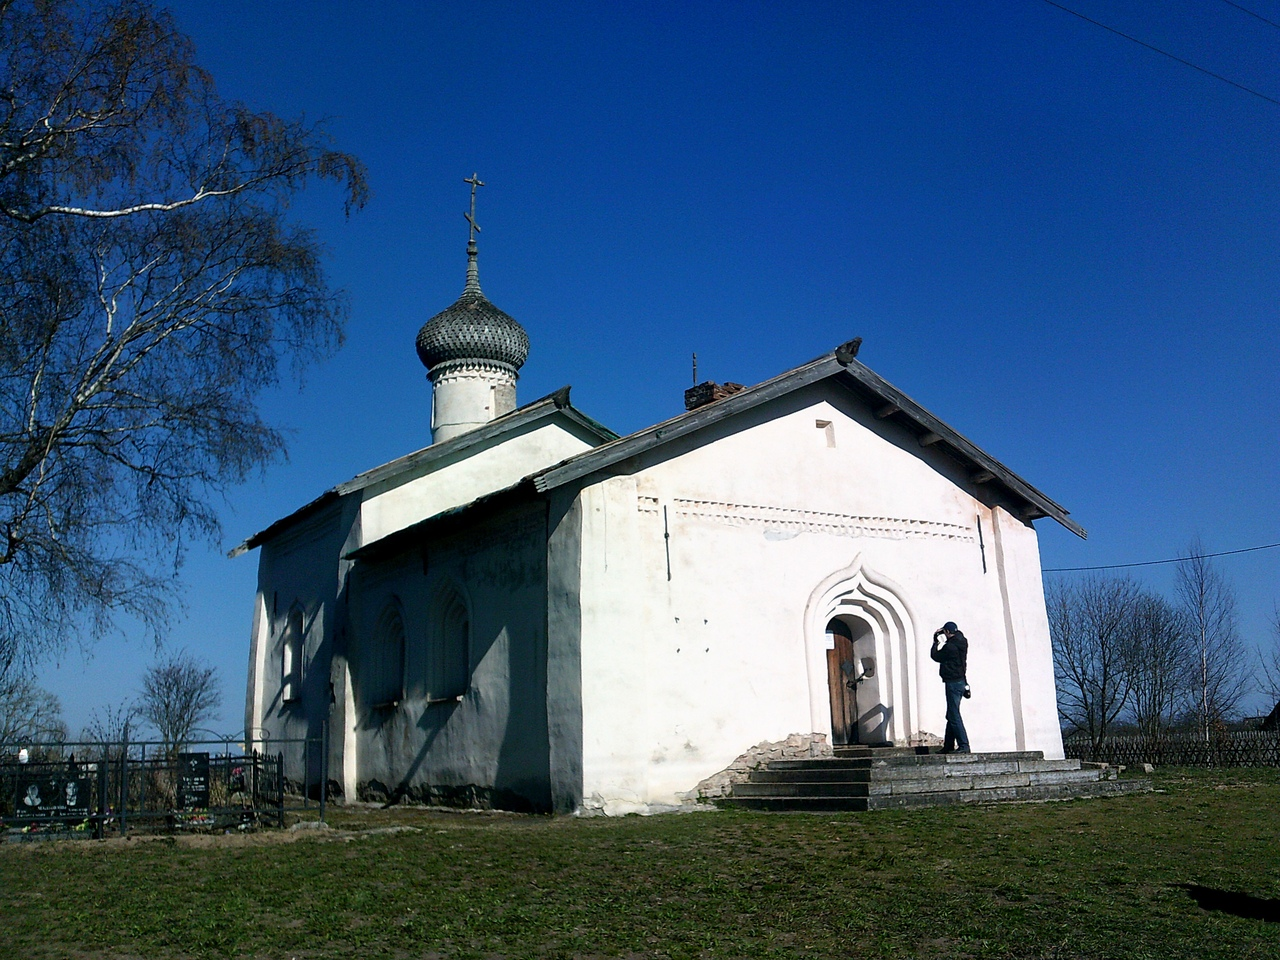 Вдоль берегов Волхова. Деревня Чернавино - родина художника Максимова